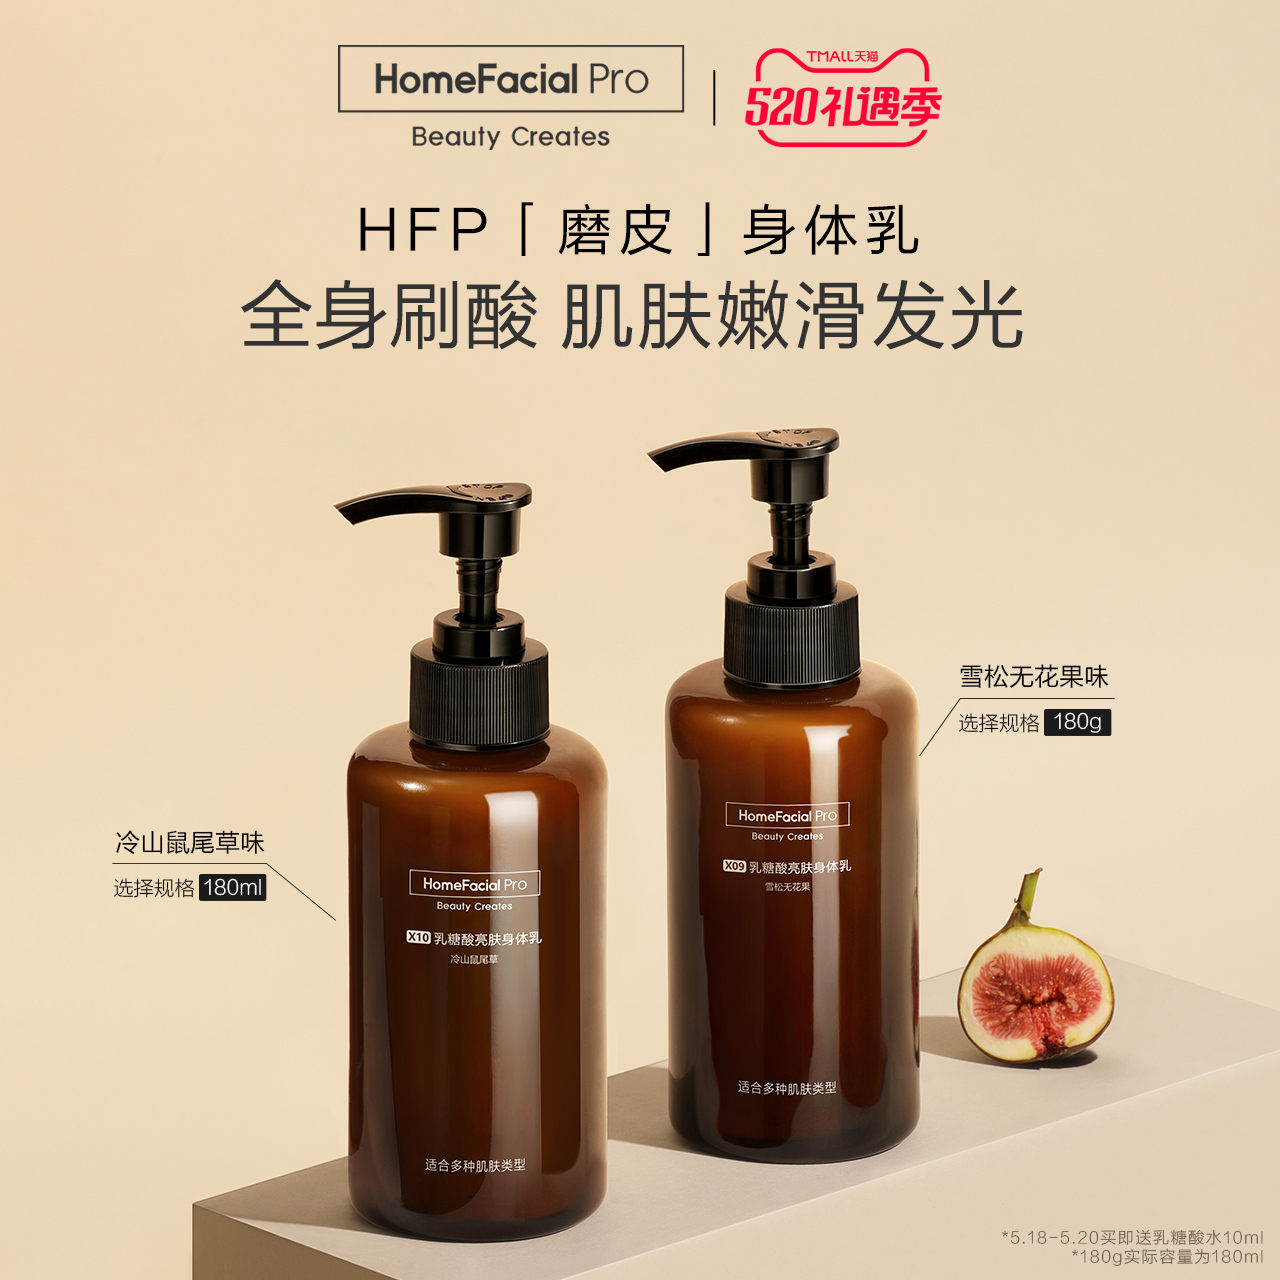 HFP乳糖酸身体乳 夏季补水润肤保湿滋润刷酸果酸香体持久留香男女